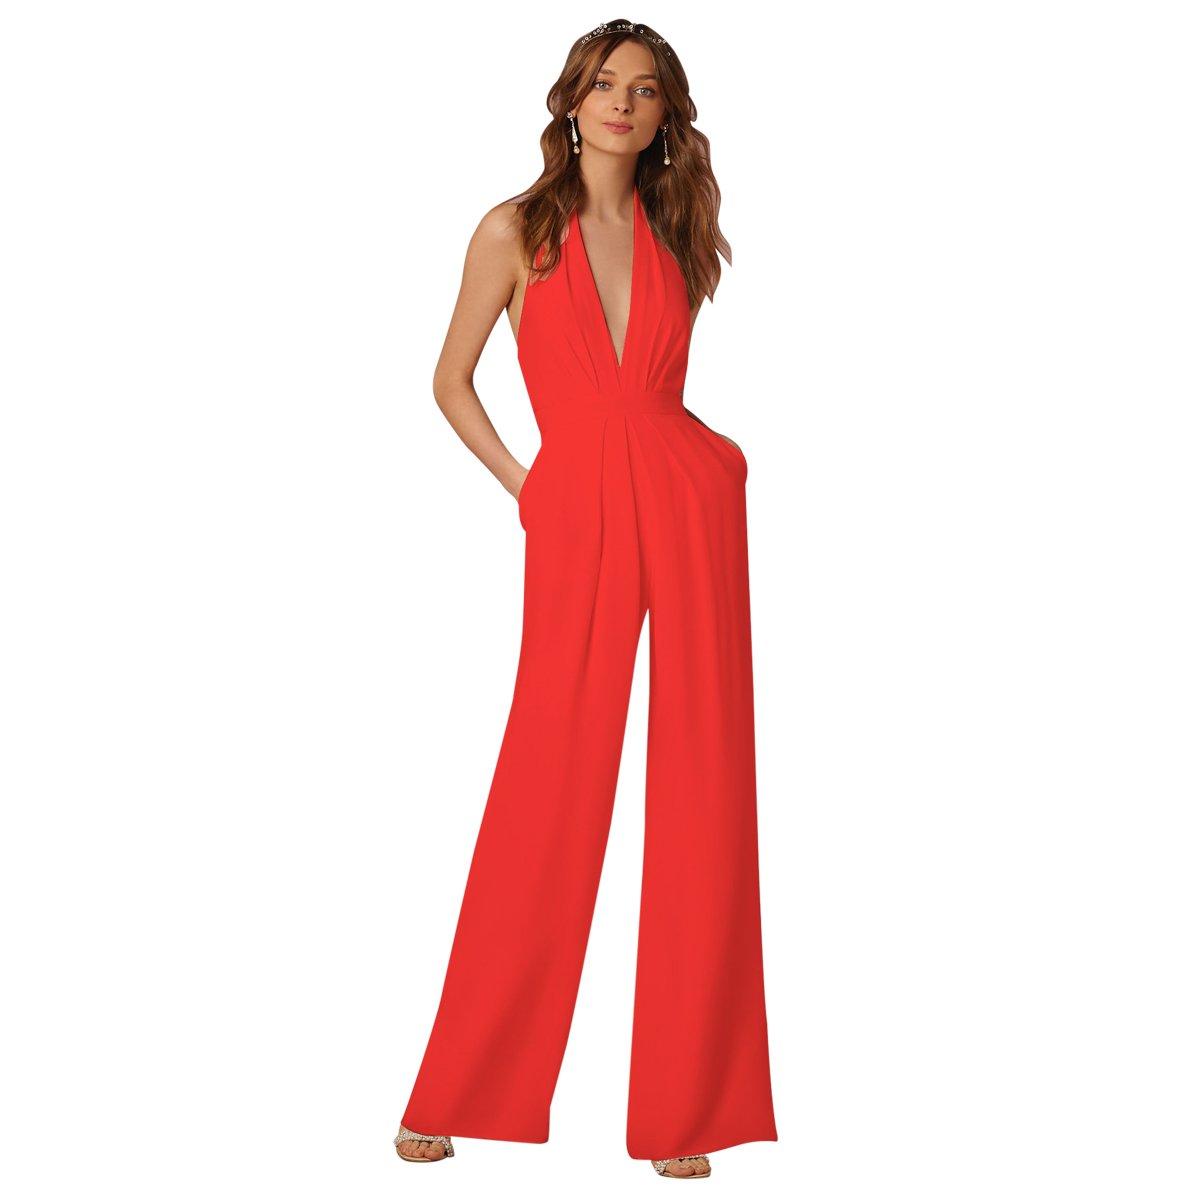 cce703e3e756 Amazon.com  IBTOM CASTLE Women s Sexy High Waisted Jumpsuits V-NeckHalter  Wide Leg Long Pants Wedding Rompers Overalls Pockets  Clothing